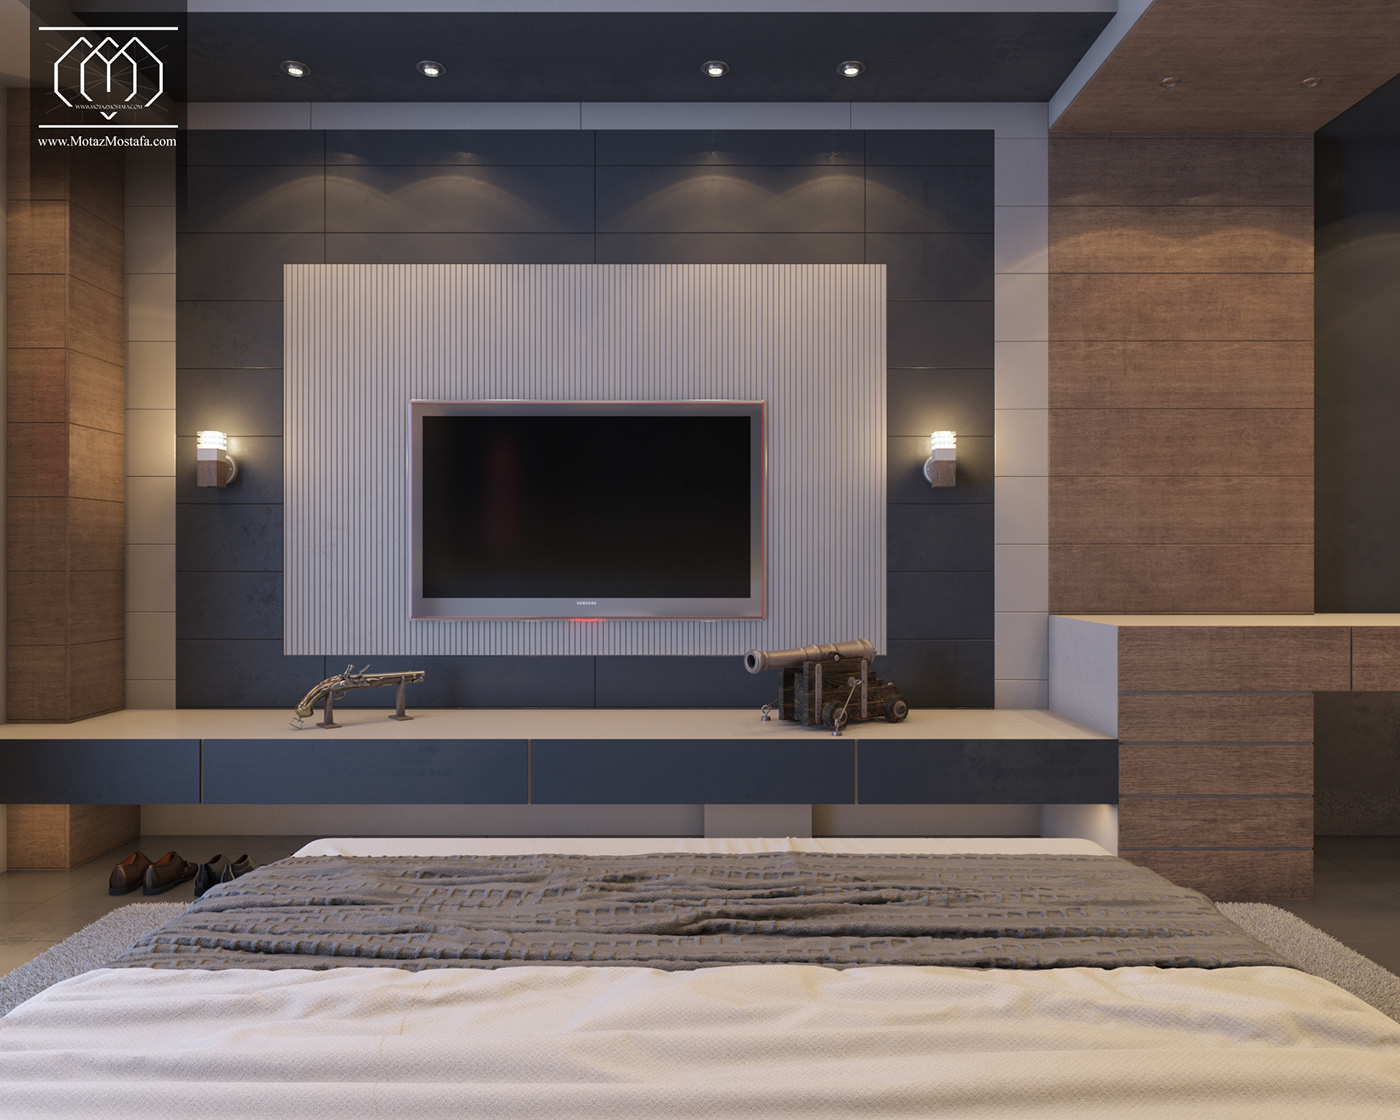 architecture interior design  3dsmax vray photoshop graphics visualization Interior design Motaz mostafa